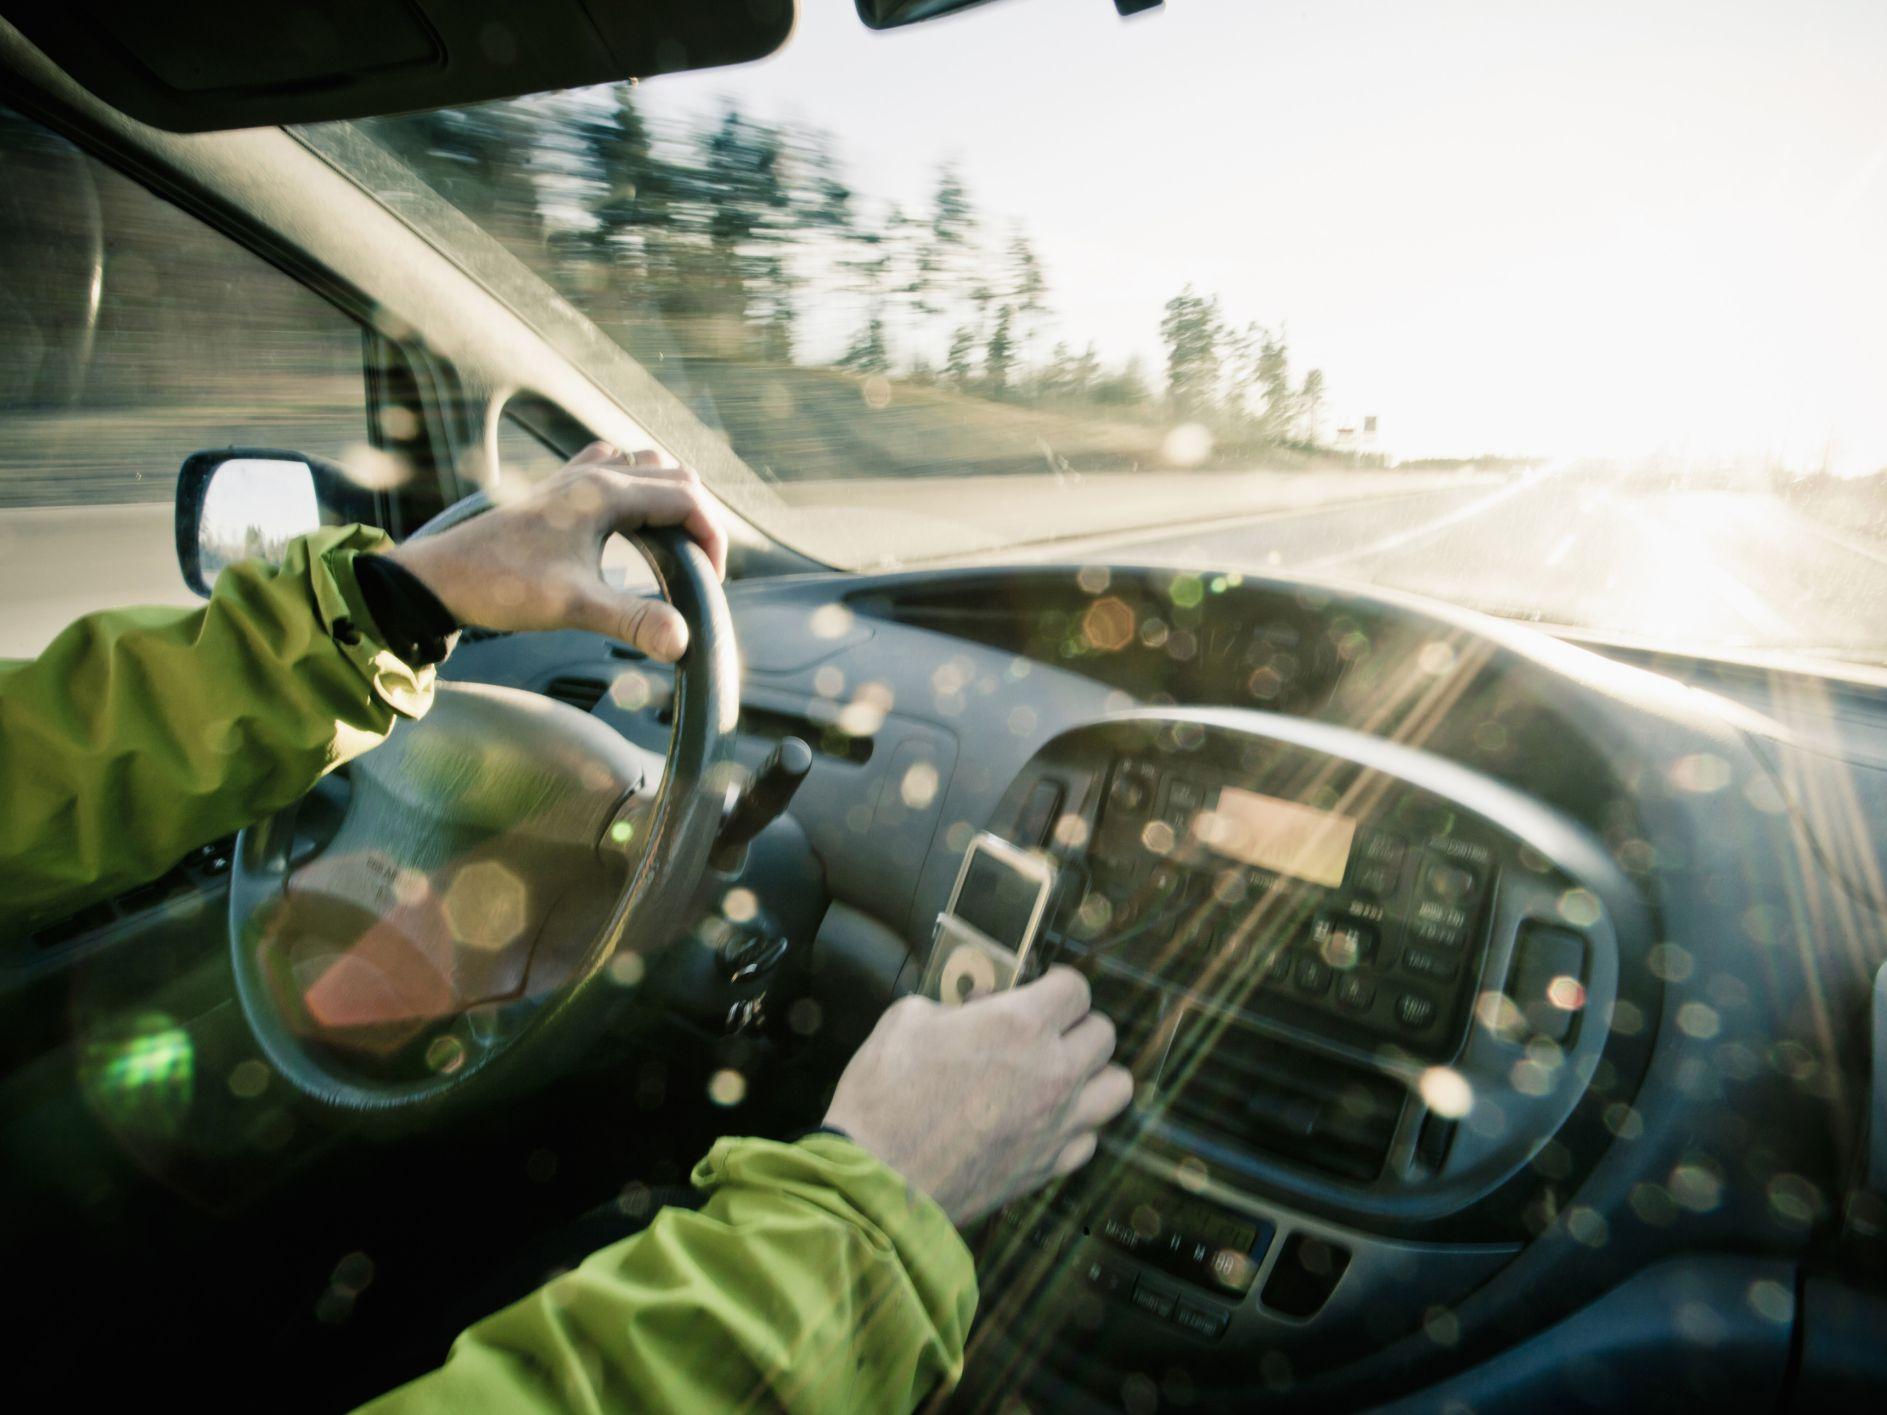 Why Do Car Radios Have USB Ports?